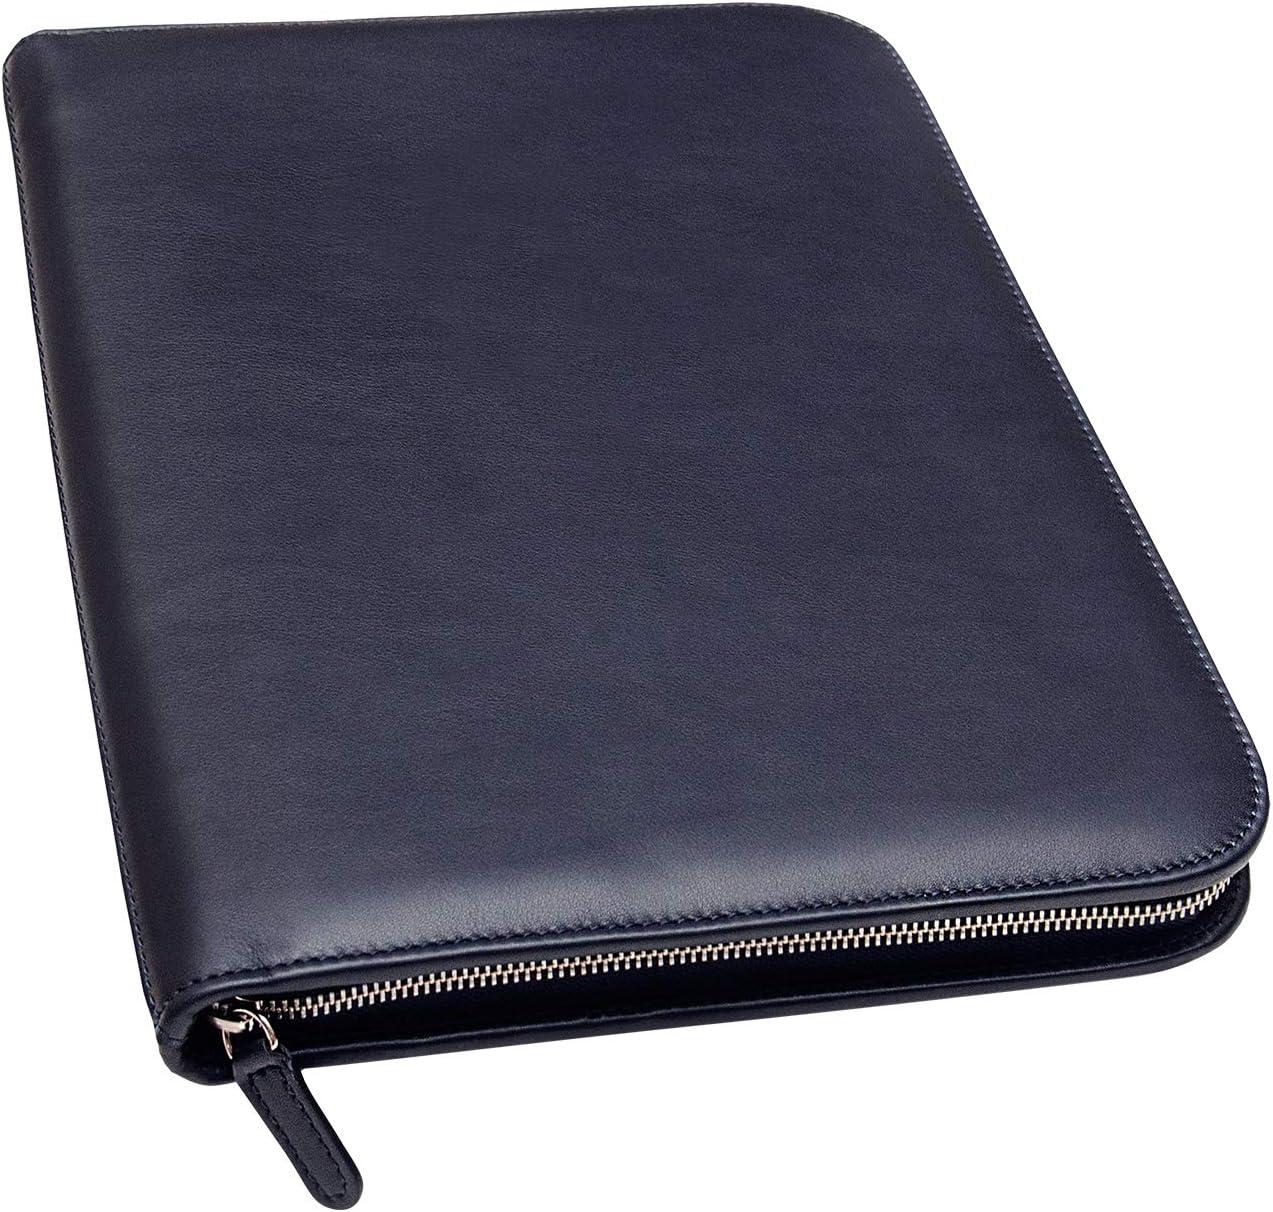 Maruse Personalized Italian Leather Executive Portfolio Padfolio, Folder Organizer with Zip Closure and Writing Pad, Handmade in Italy, Navy